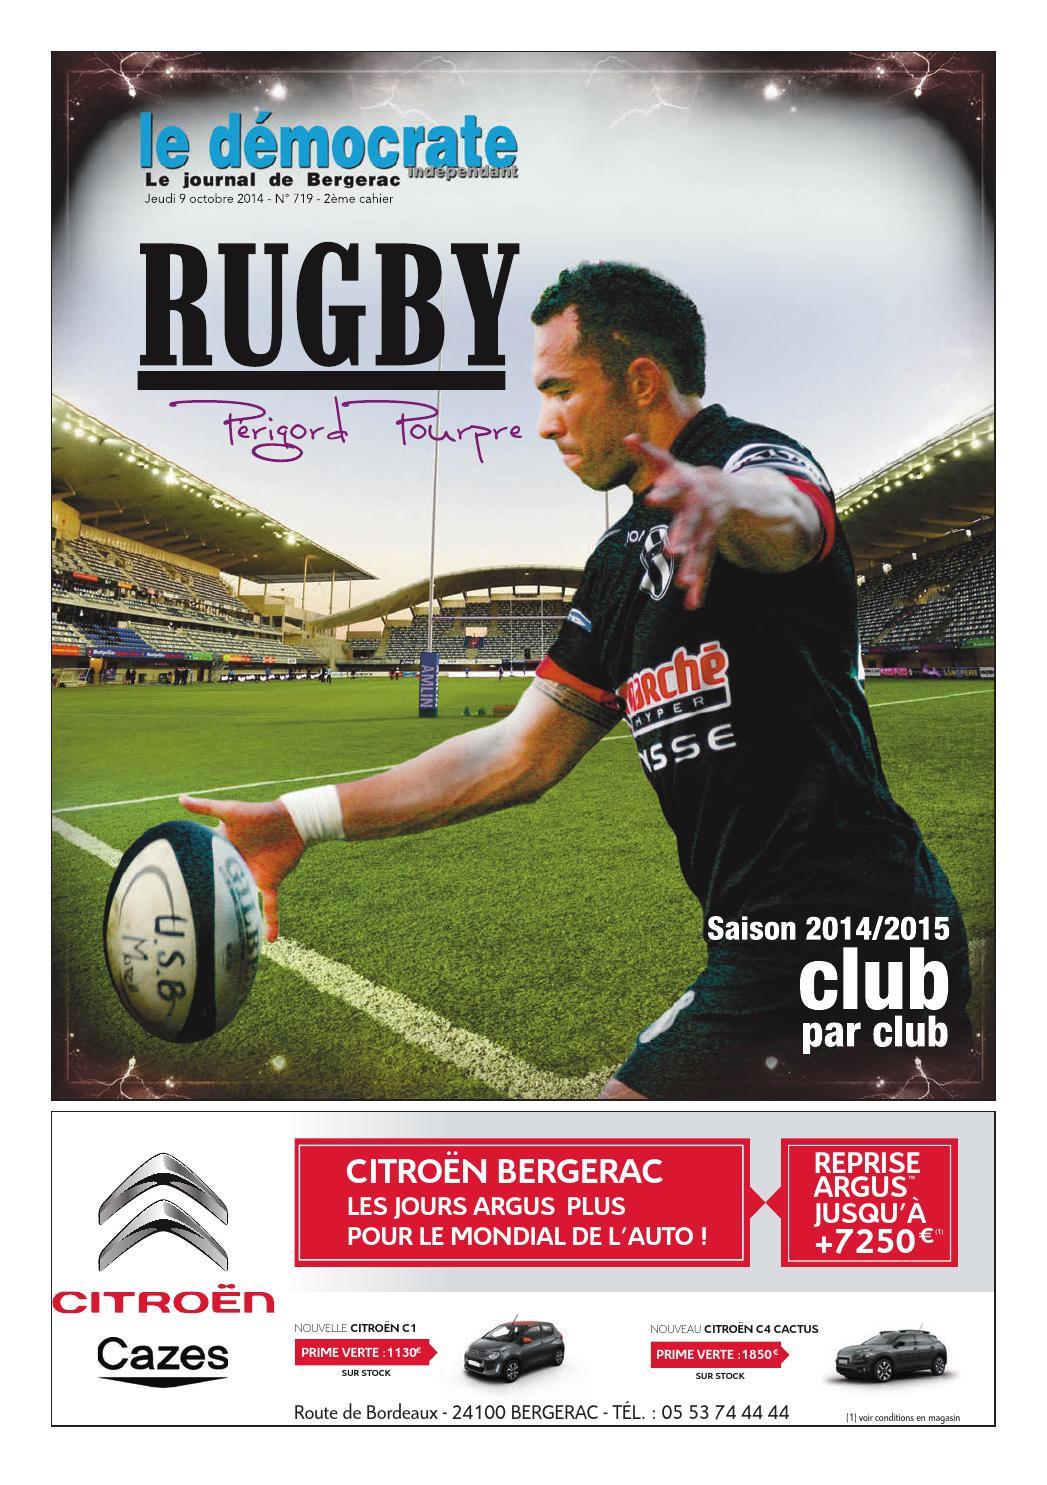 rugby2014 by la semaine des pyr n es issuu. Black Bedroom Furniture Sets. Home Design Ideas